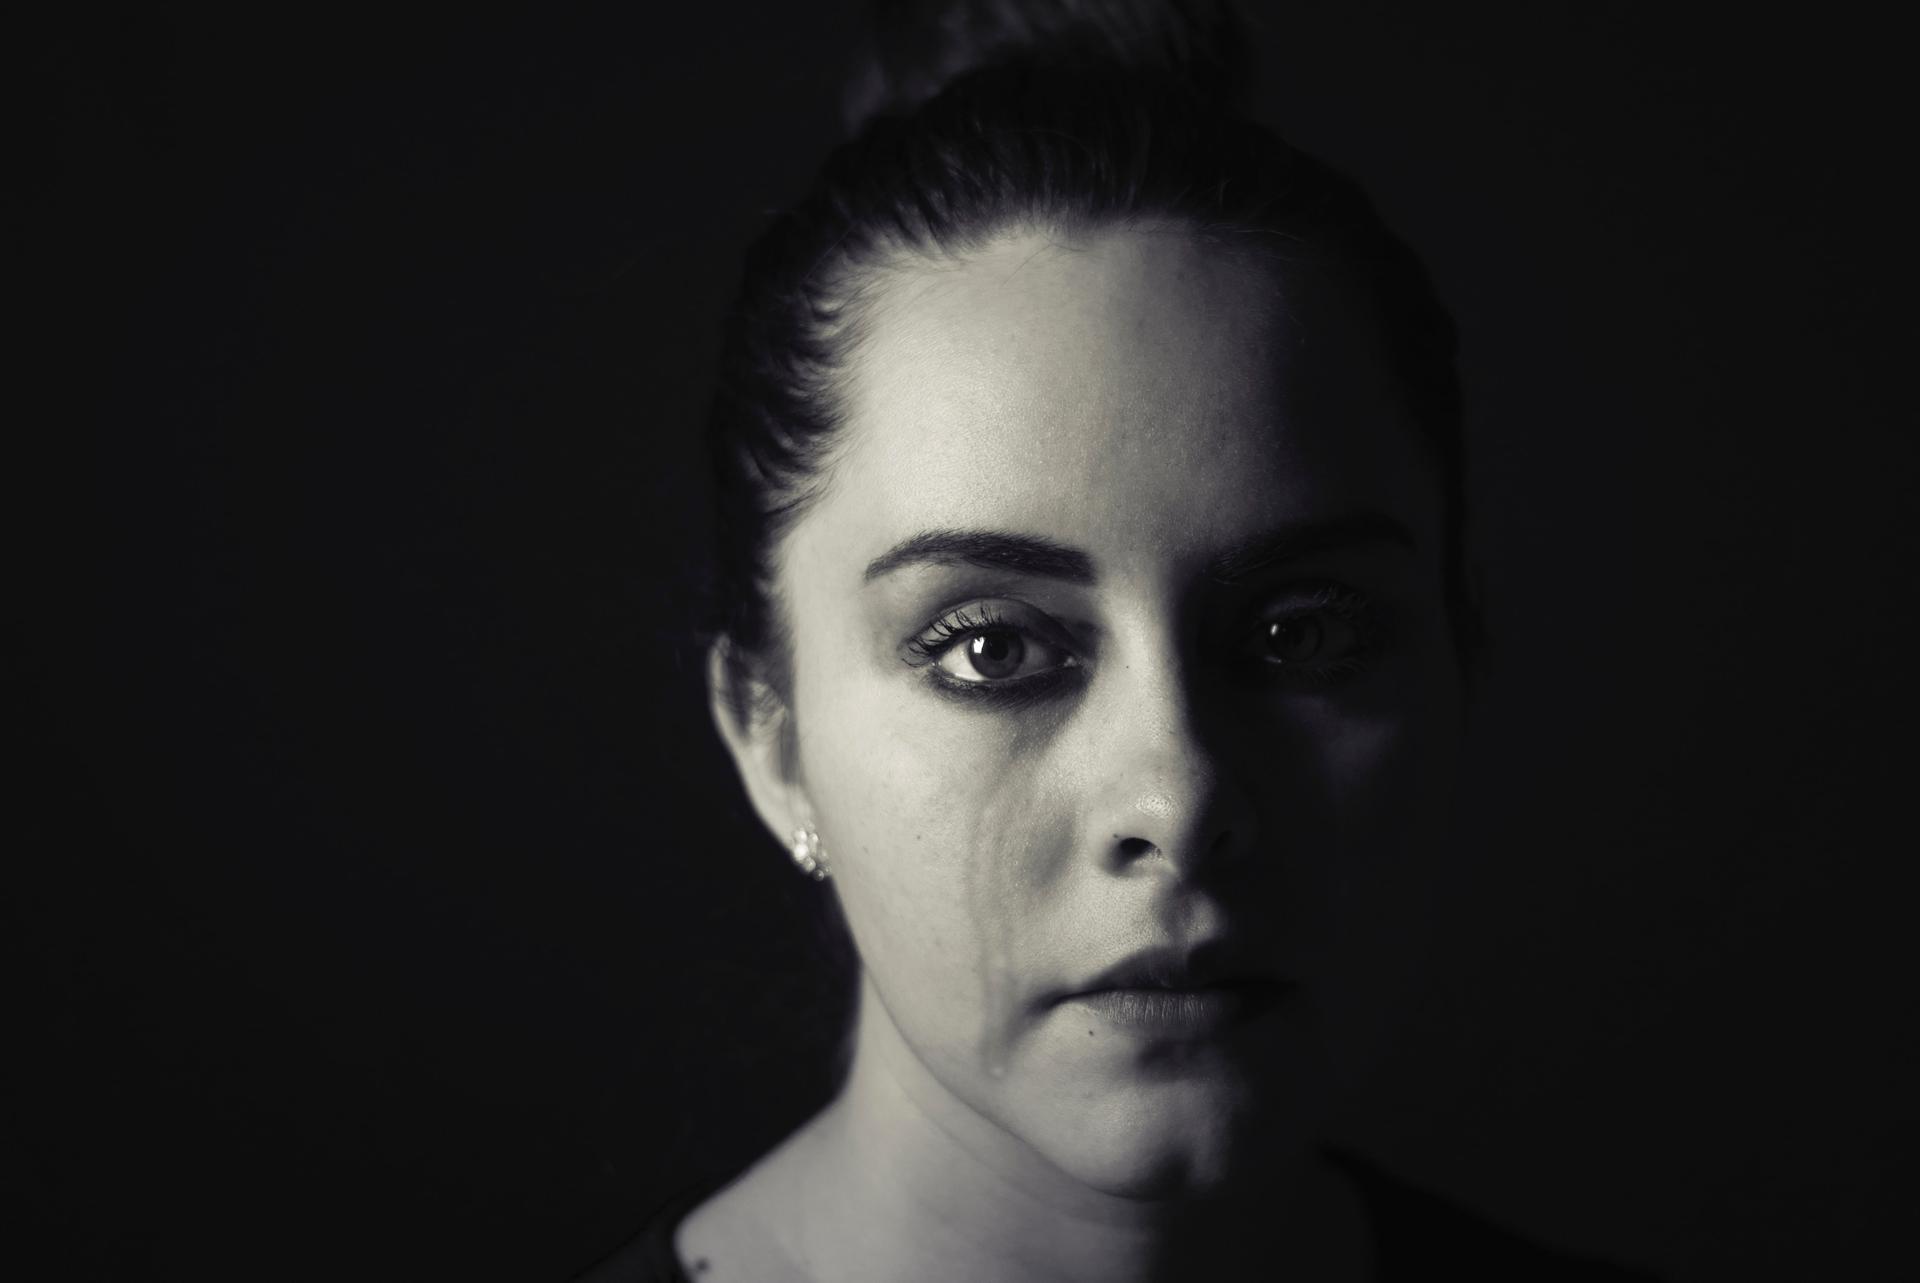 woman's face with tear